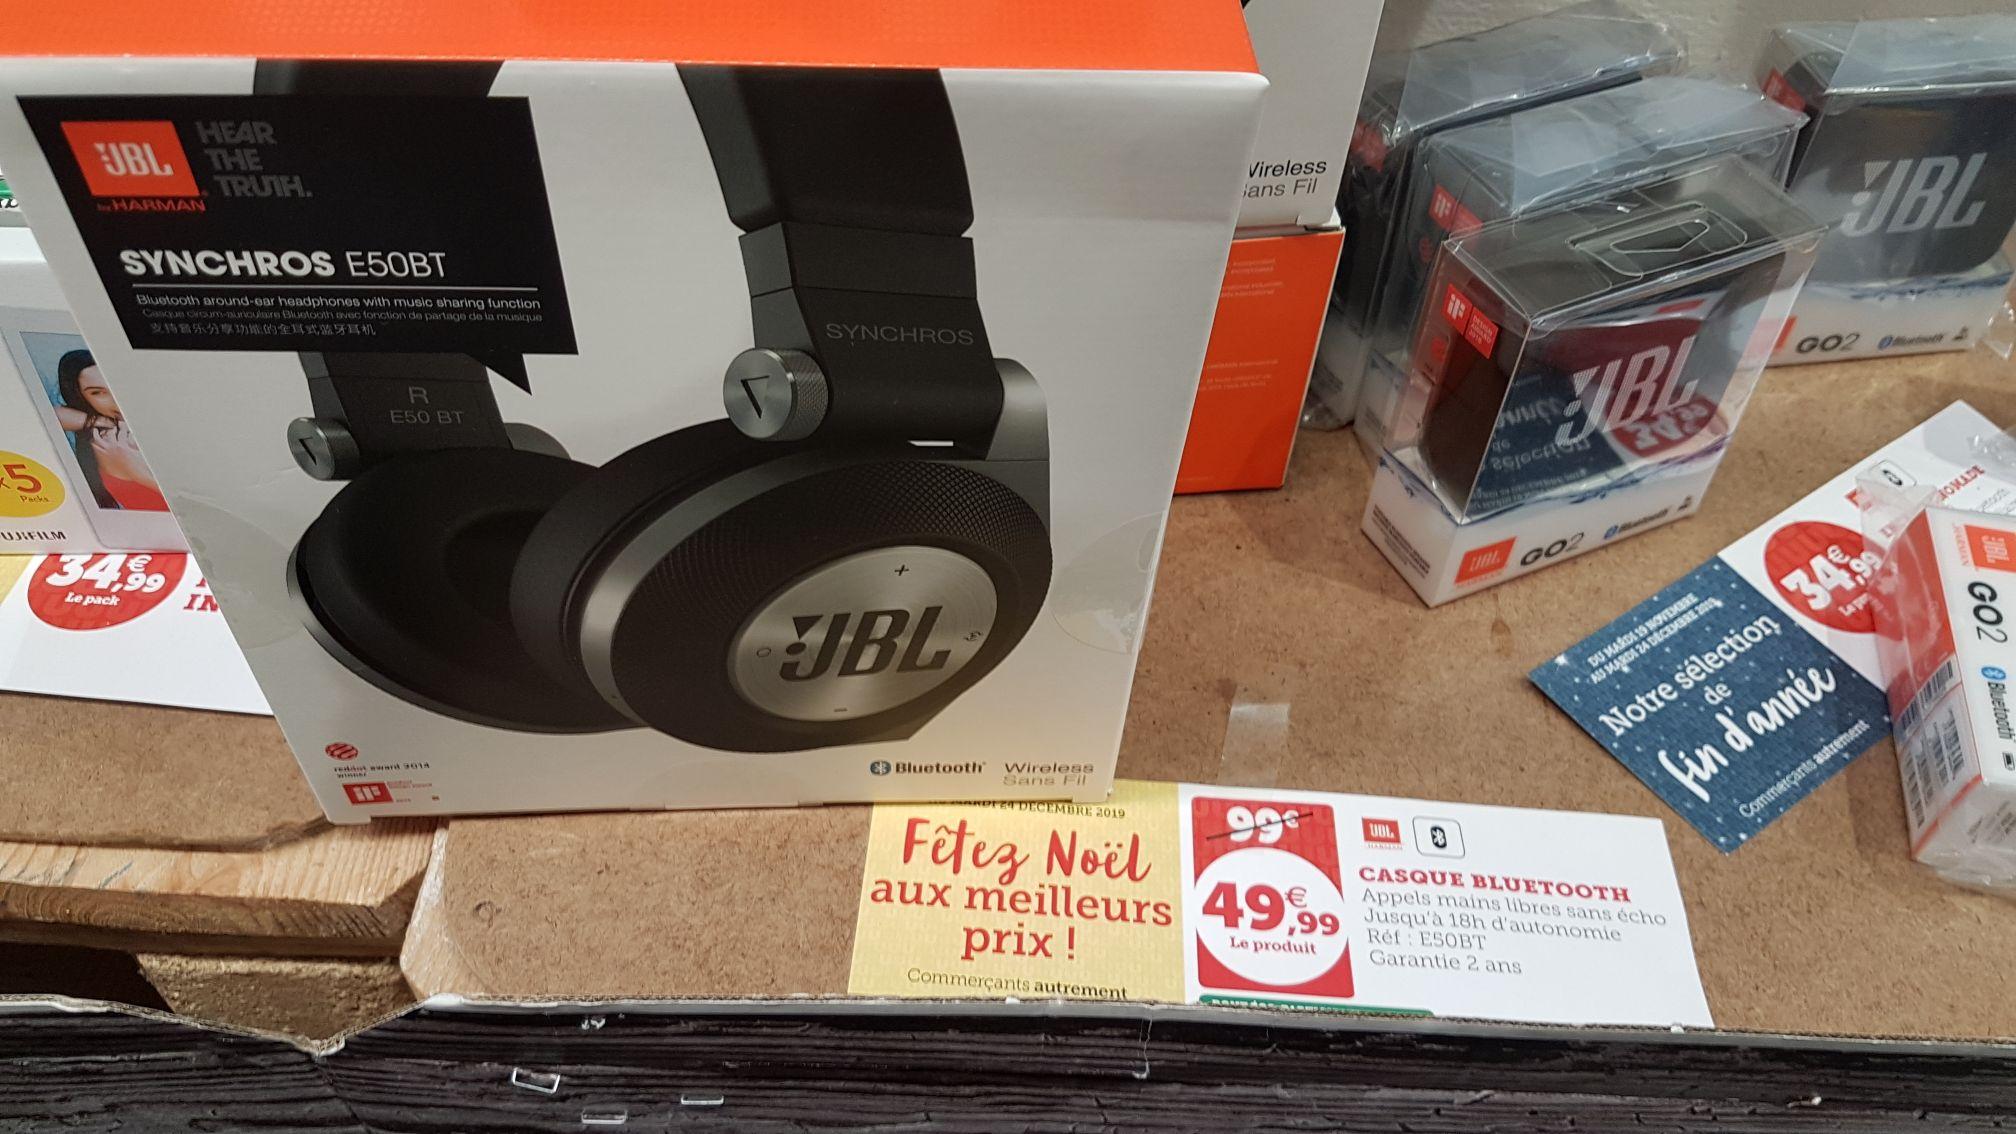 Casque audio sans-fil JBL E50BT - Bluetooth,